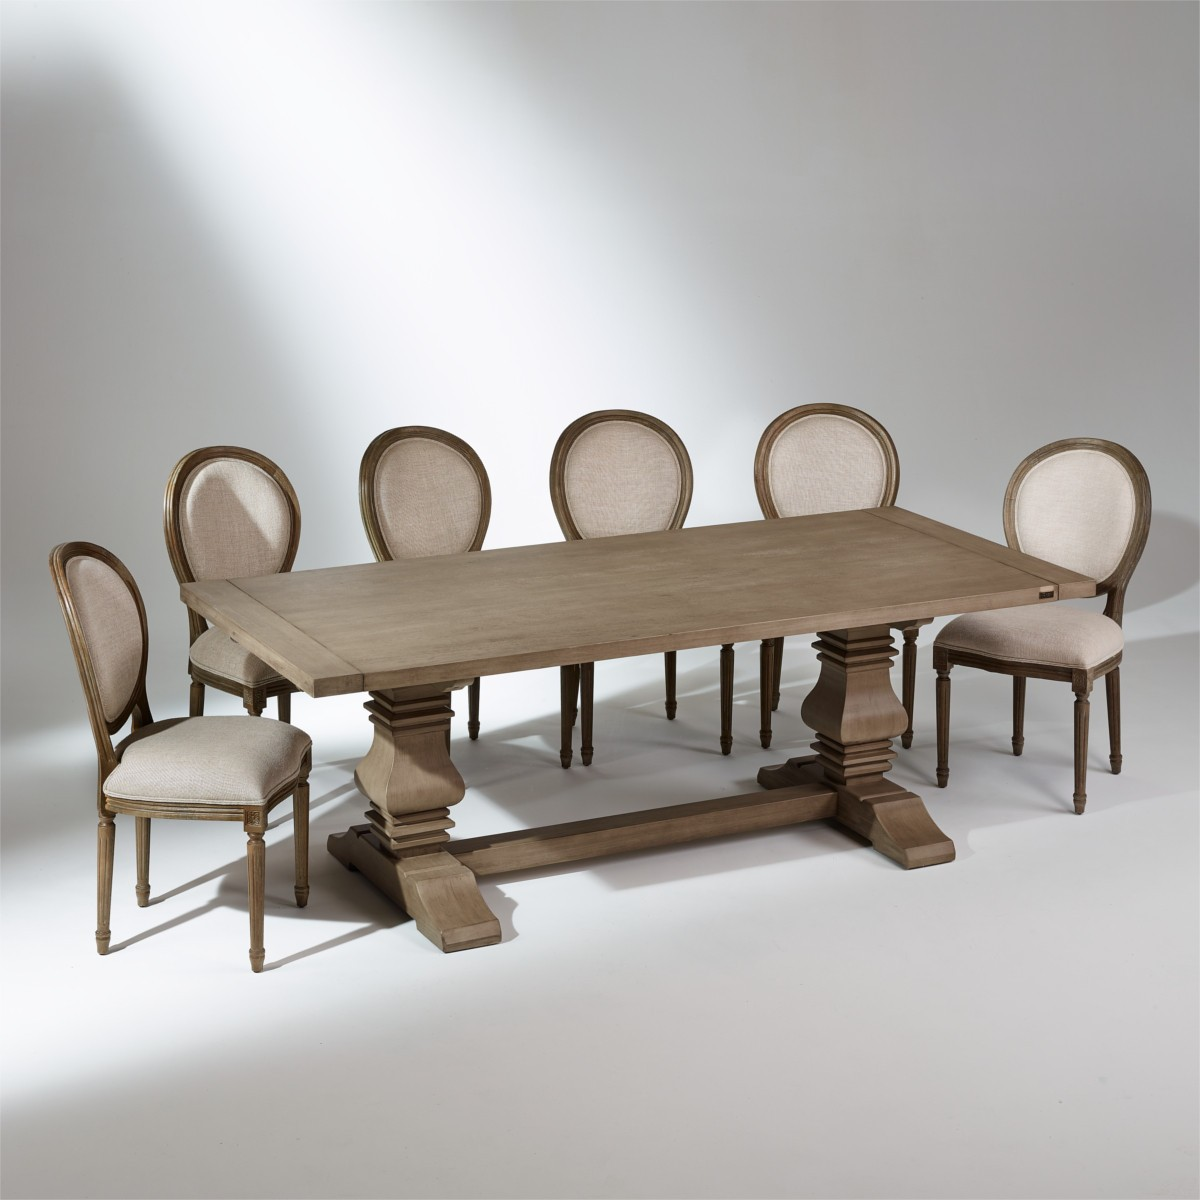 table monast re rallonges penelope 10 14 couverts. Black Bedroom Furniture Sets. Home Design Ideas